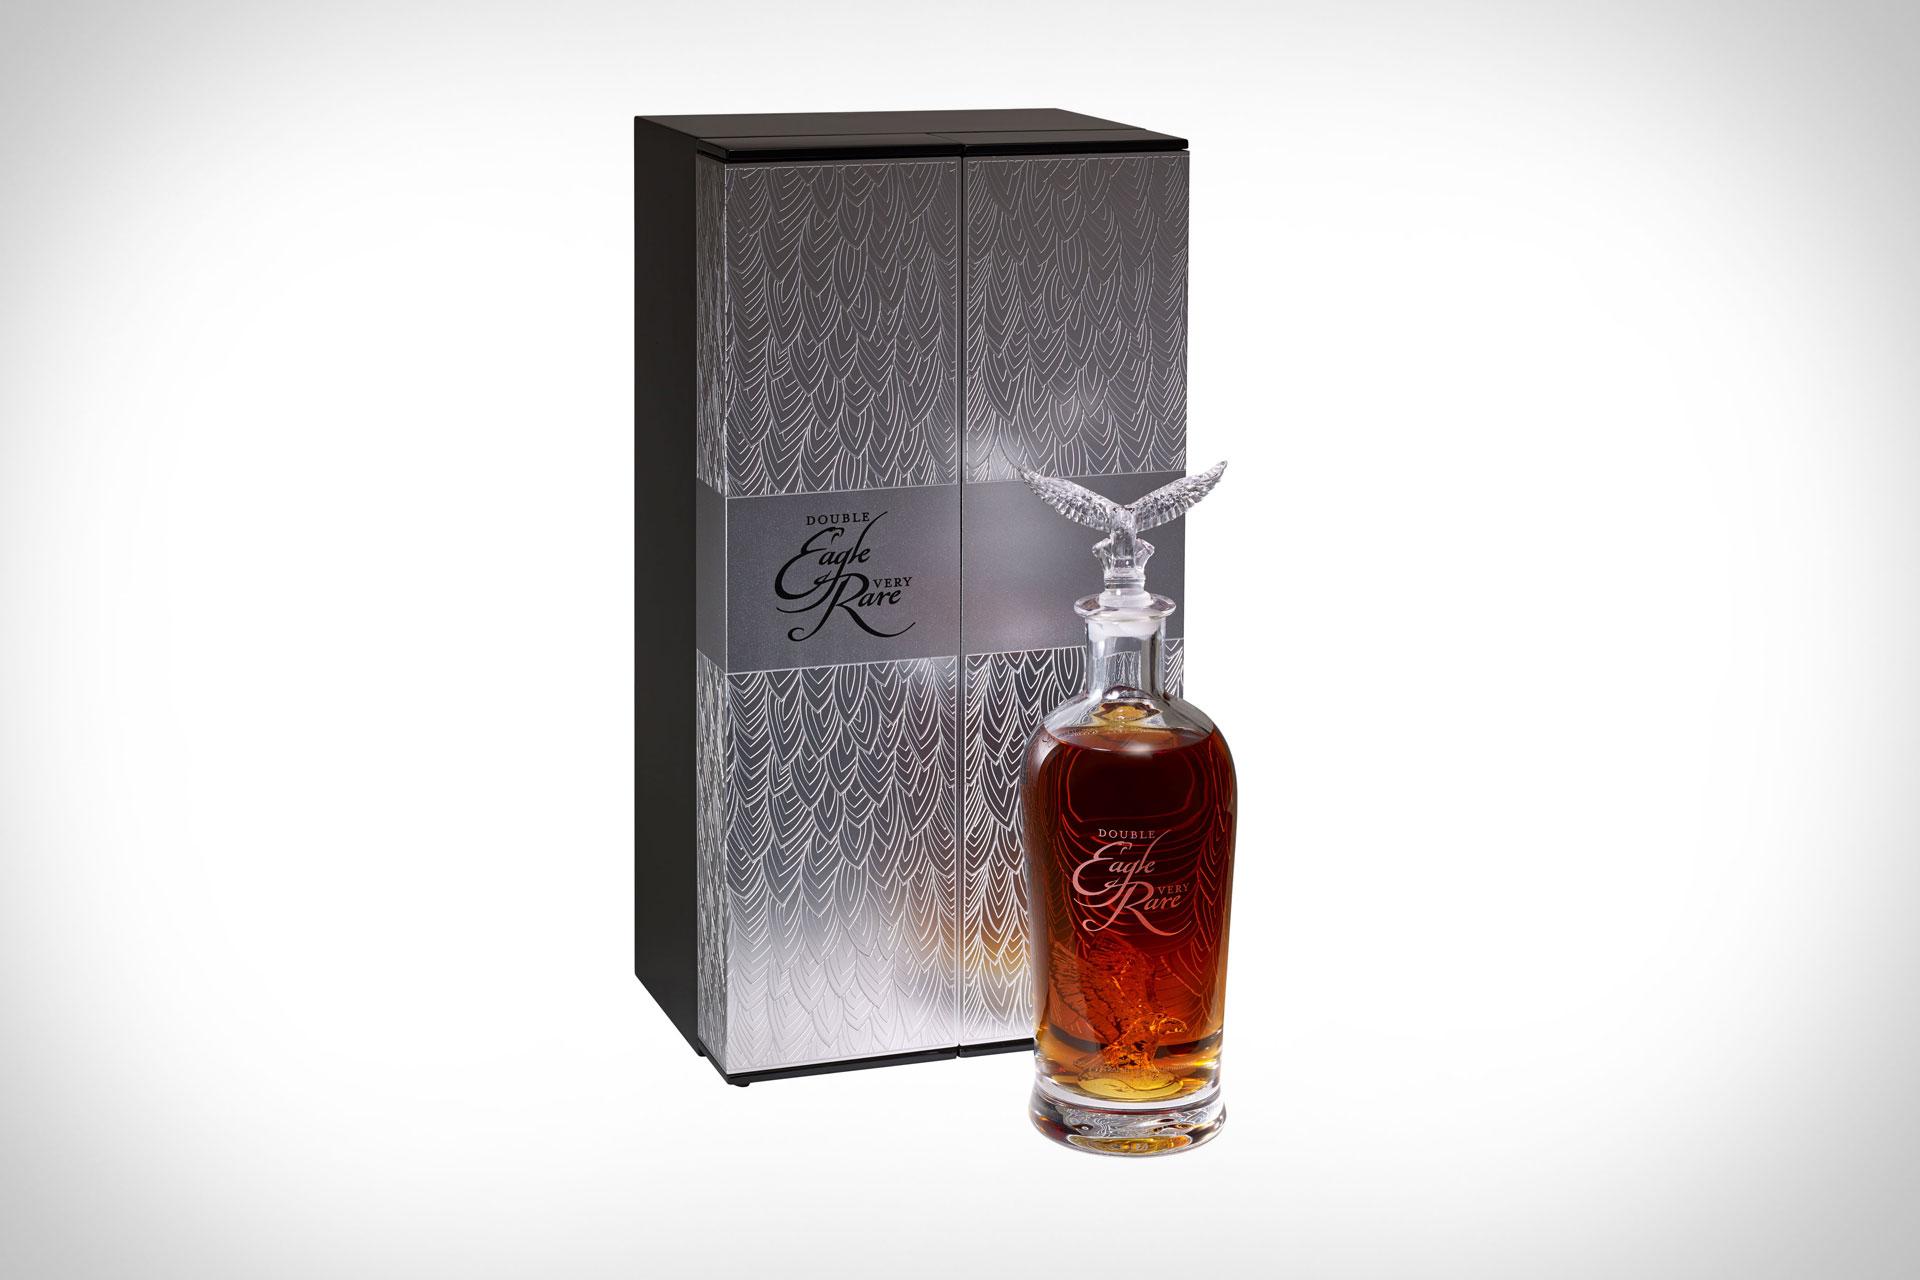 Double Eagle Very Rare Bourbon